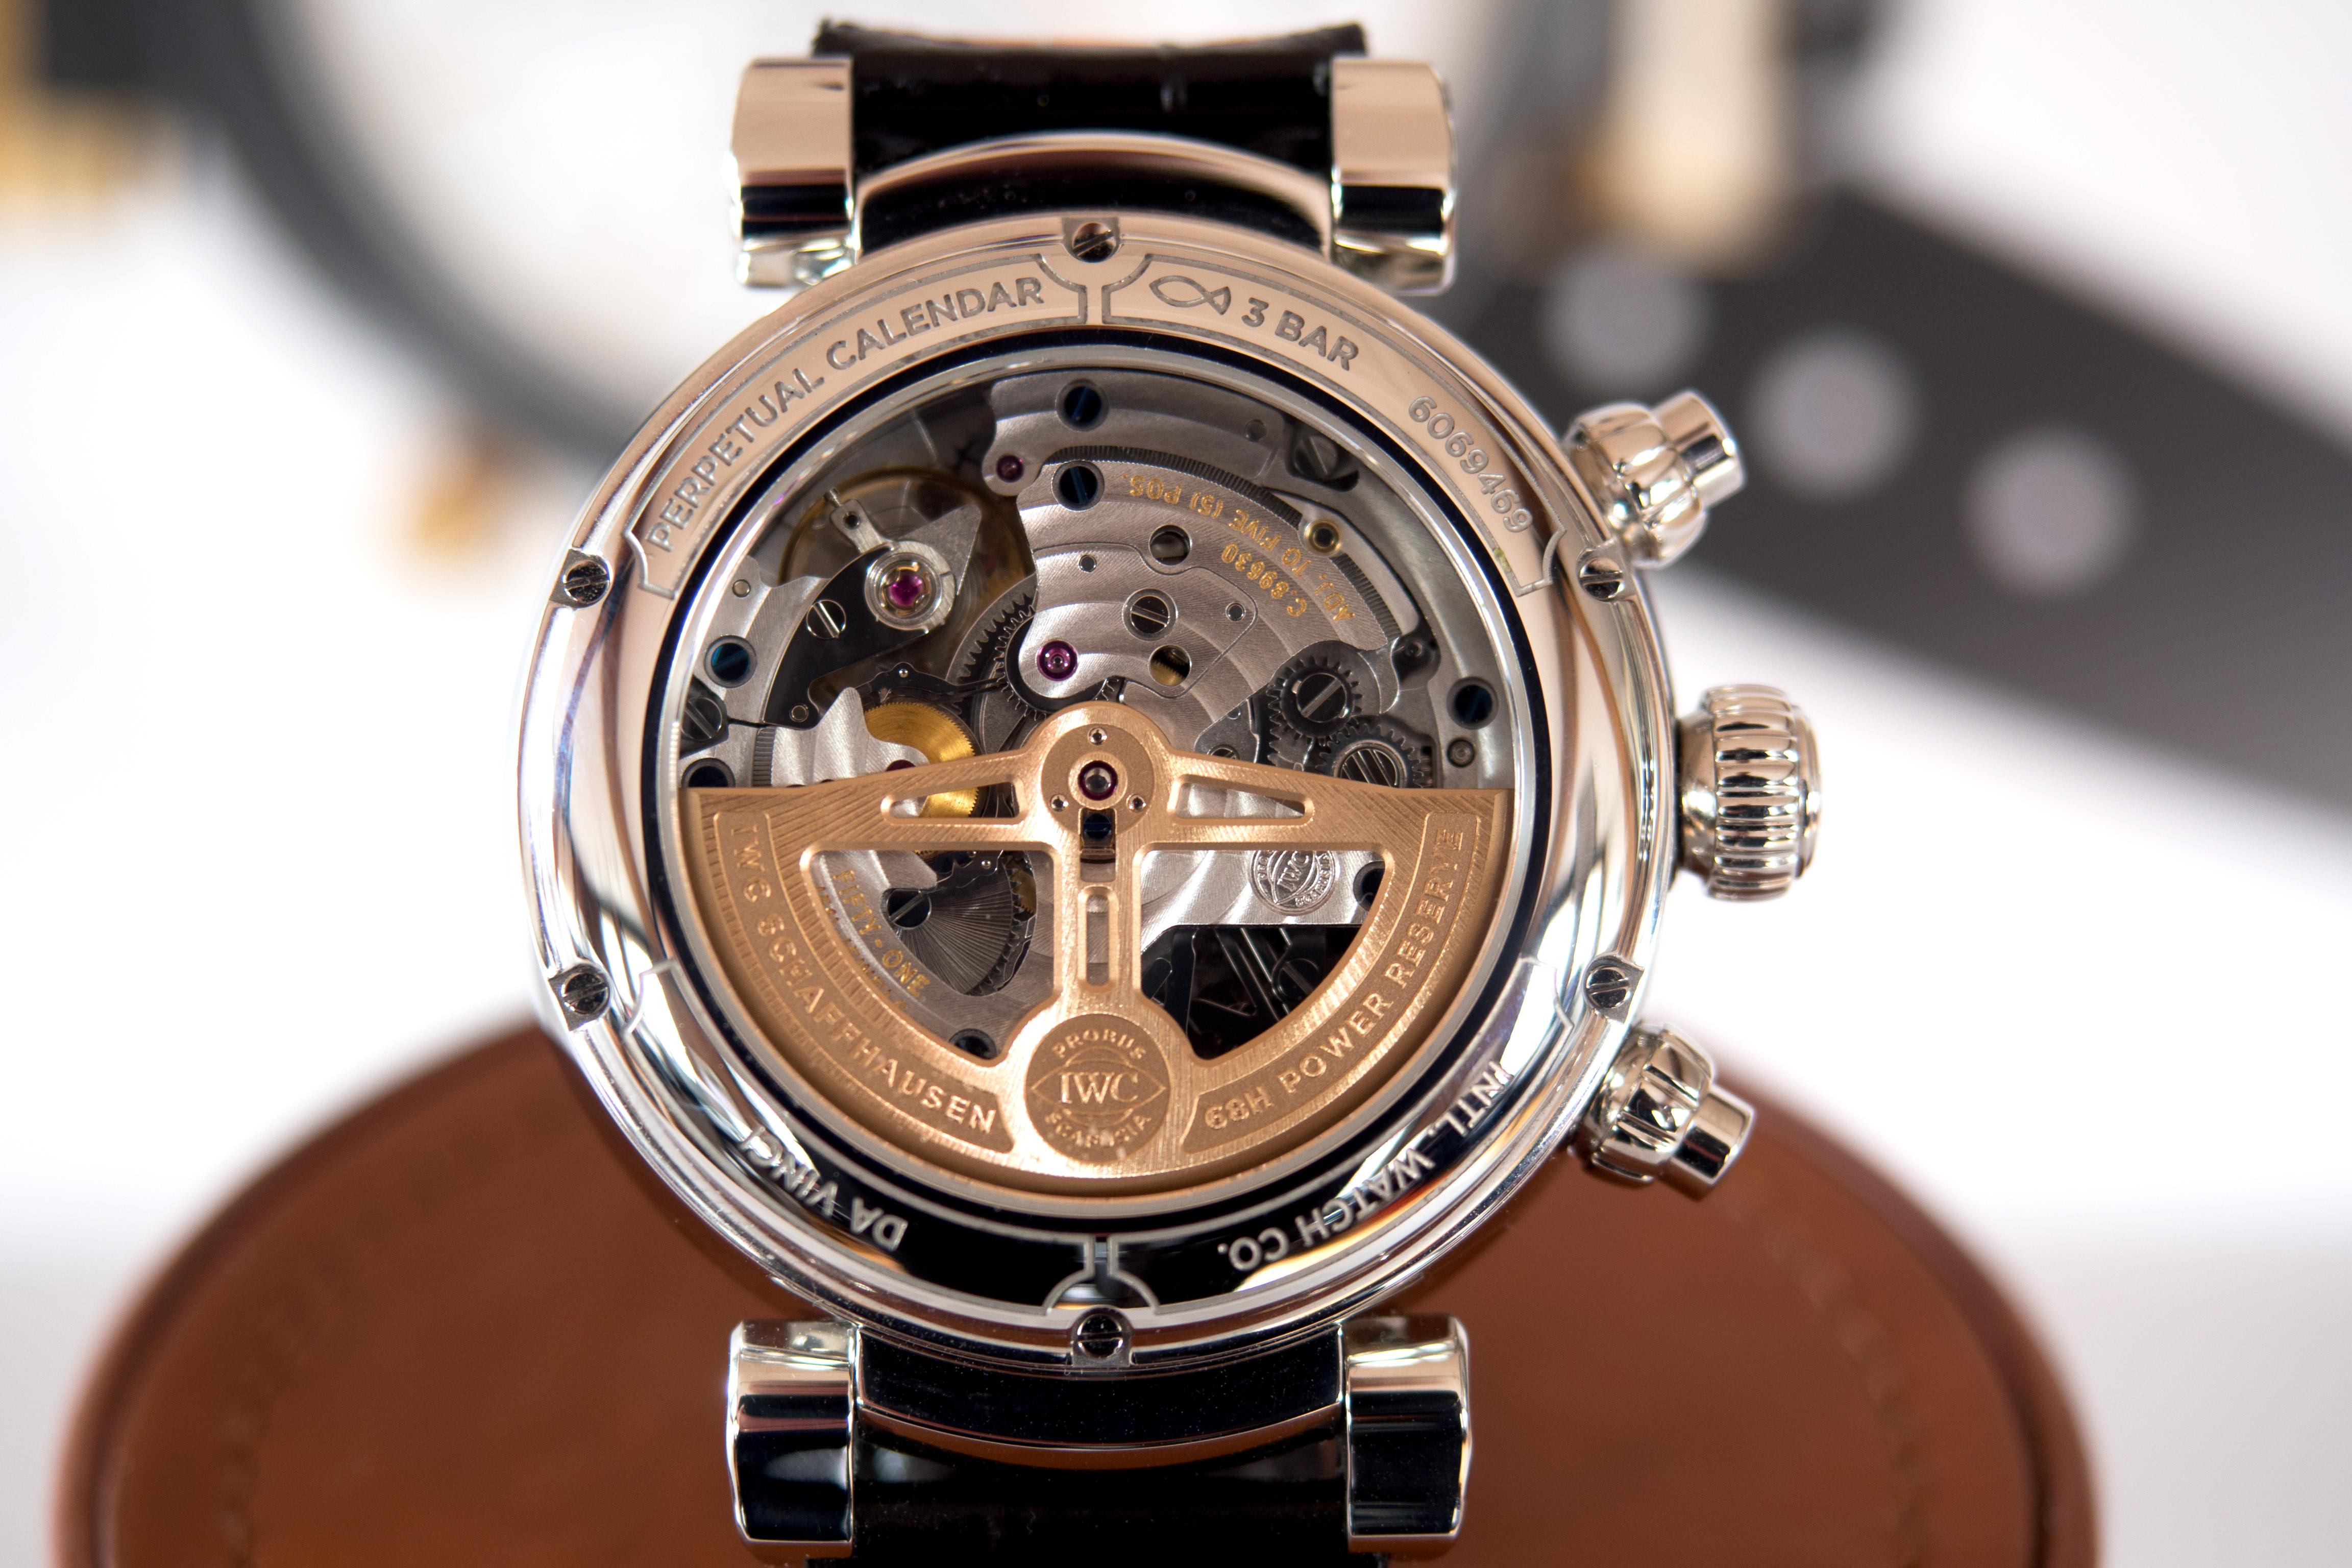 A Week On The Wrist: The IWC Da Vinci Perpetual Calendar